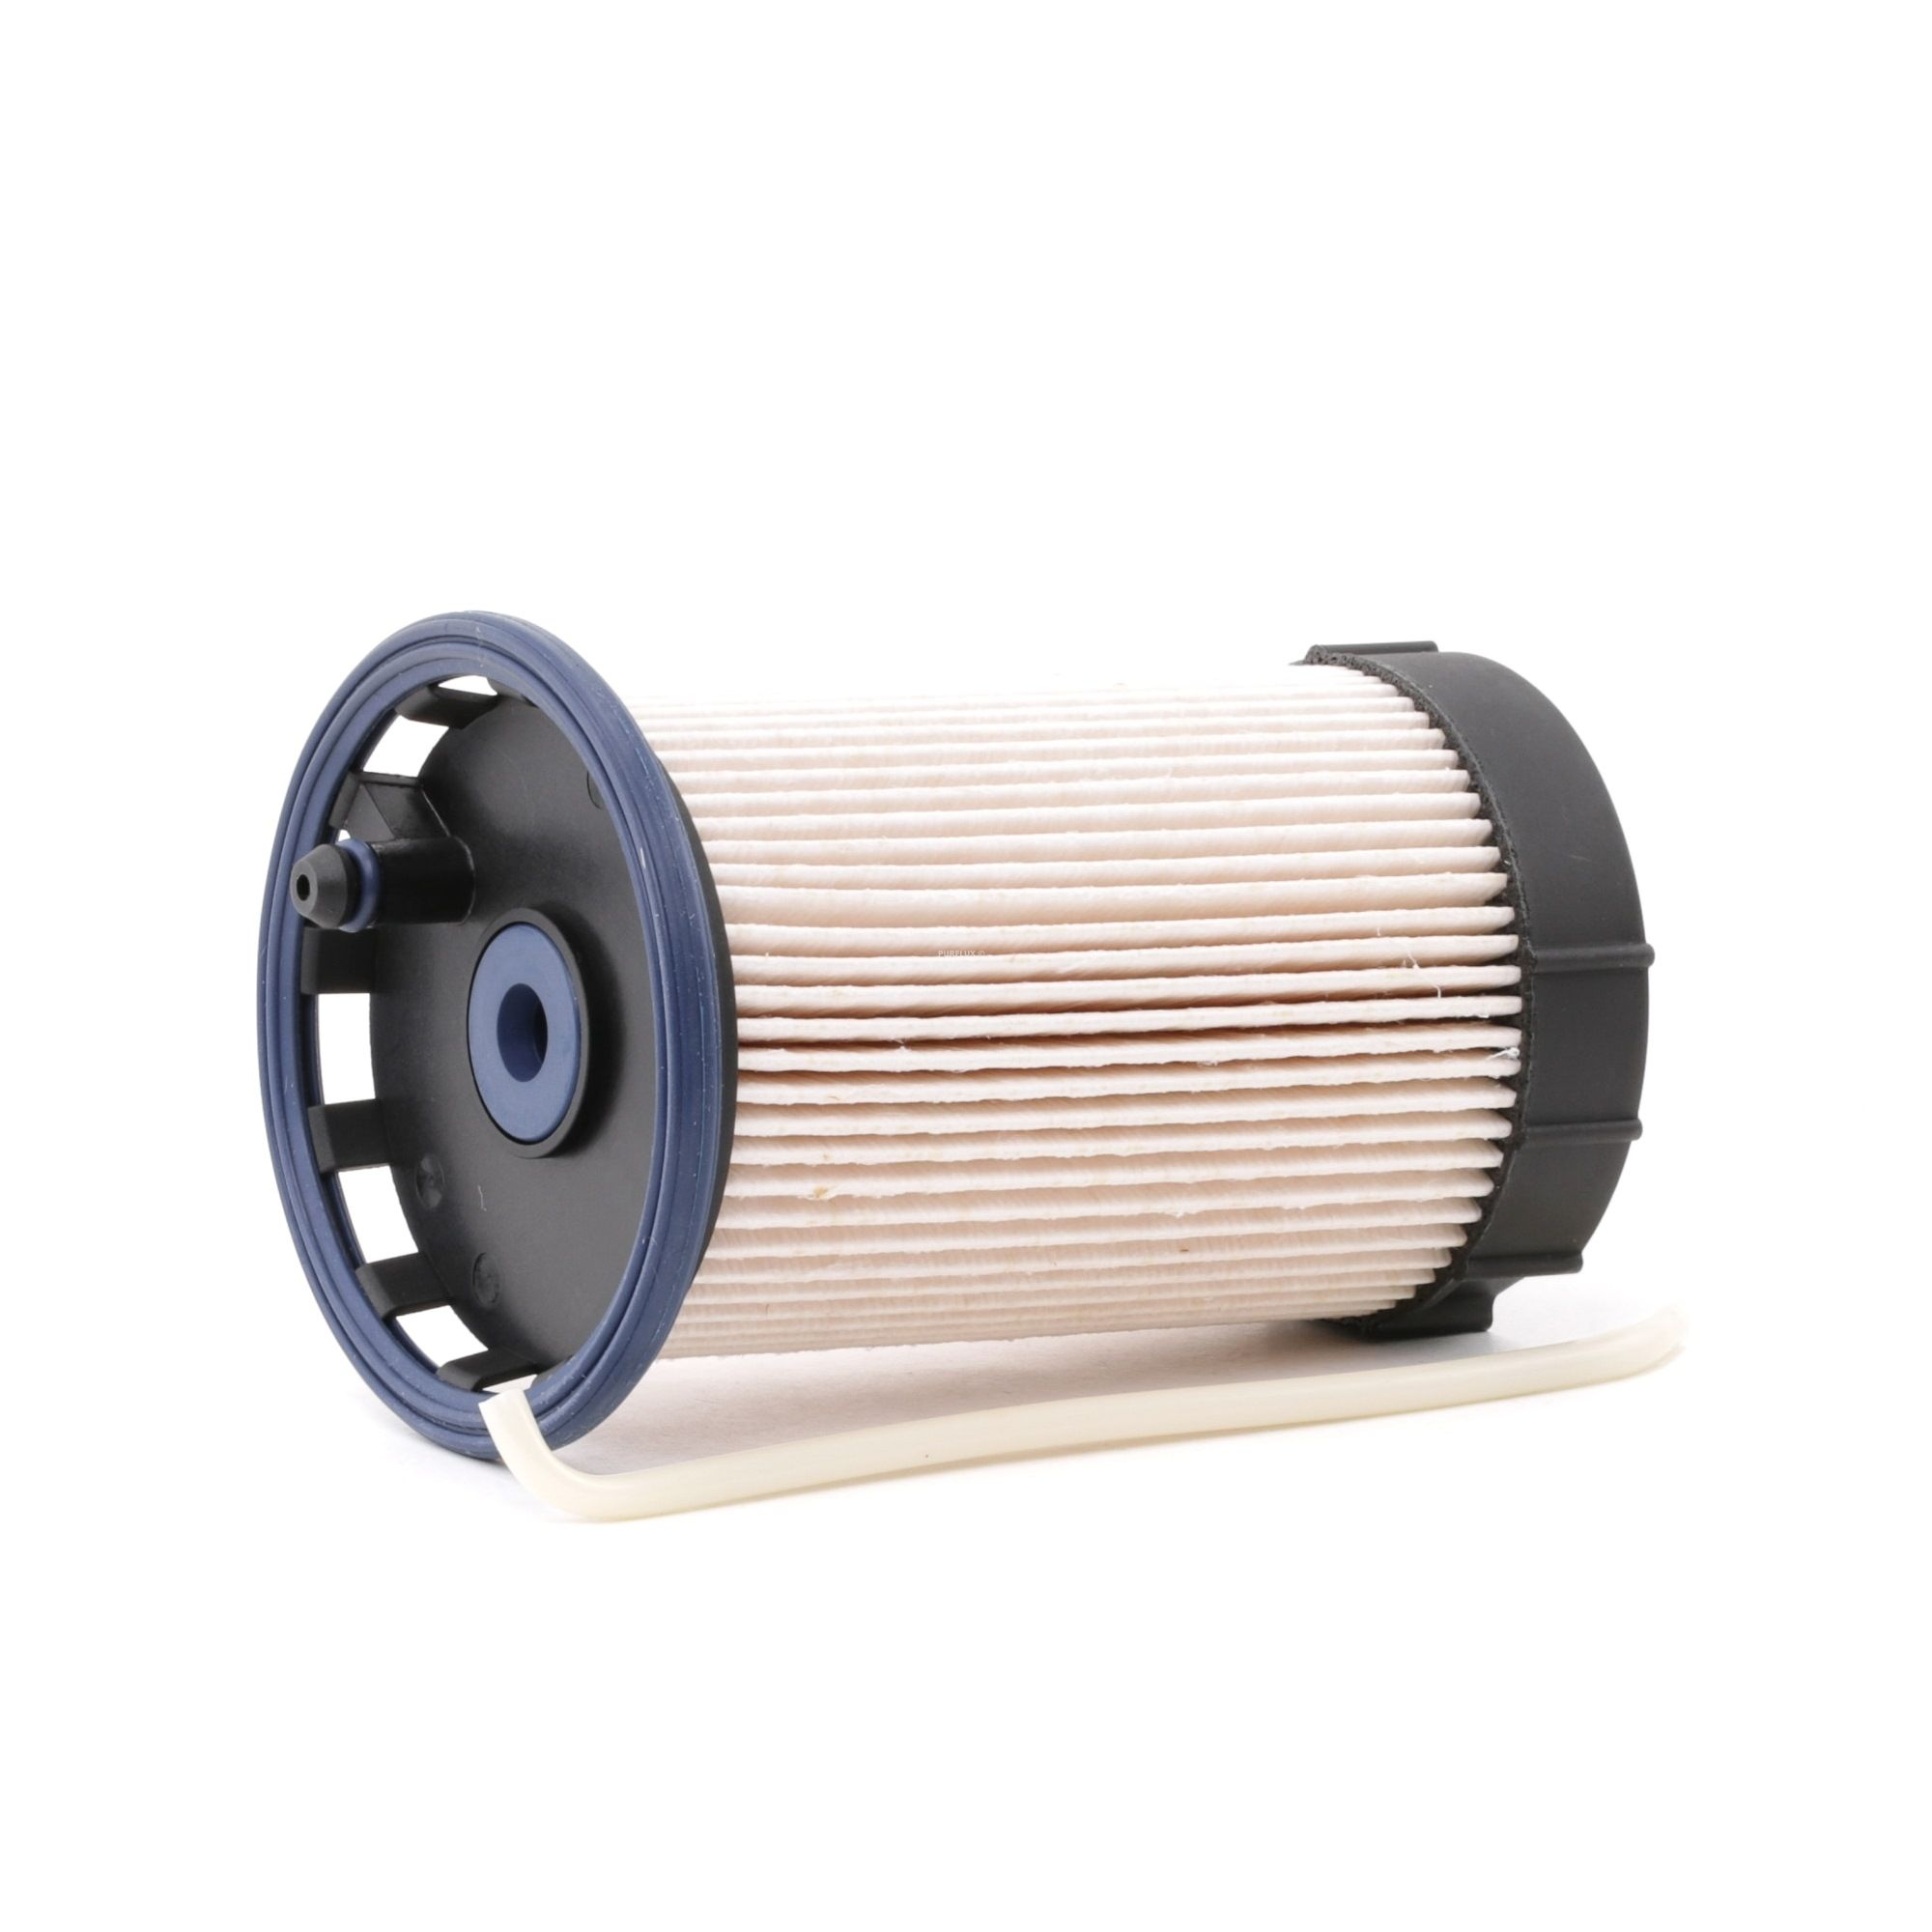 Image of PURFLUX Fuel Filter VW,SKODA,AUDI C873